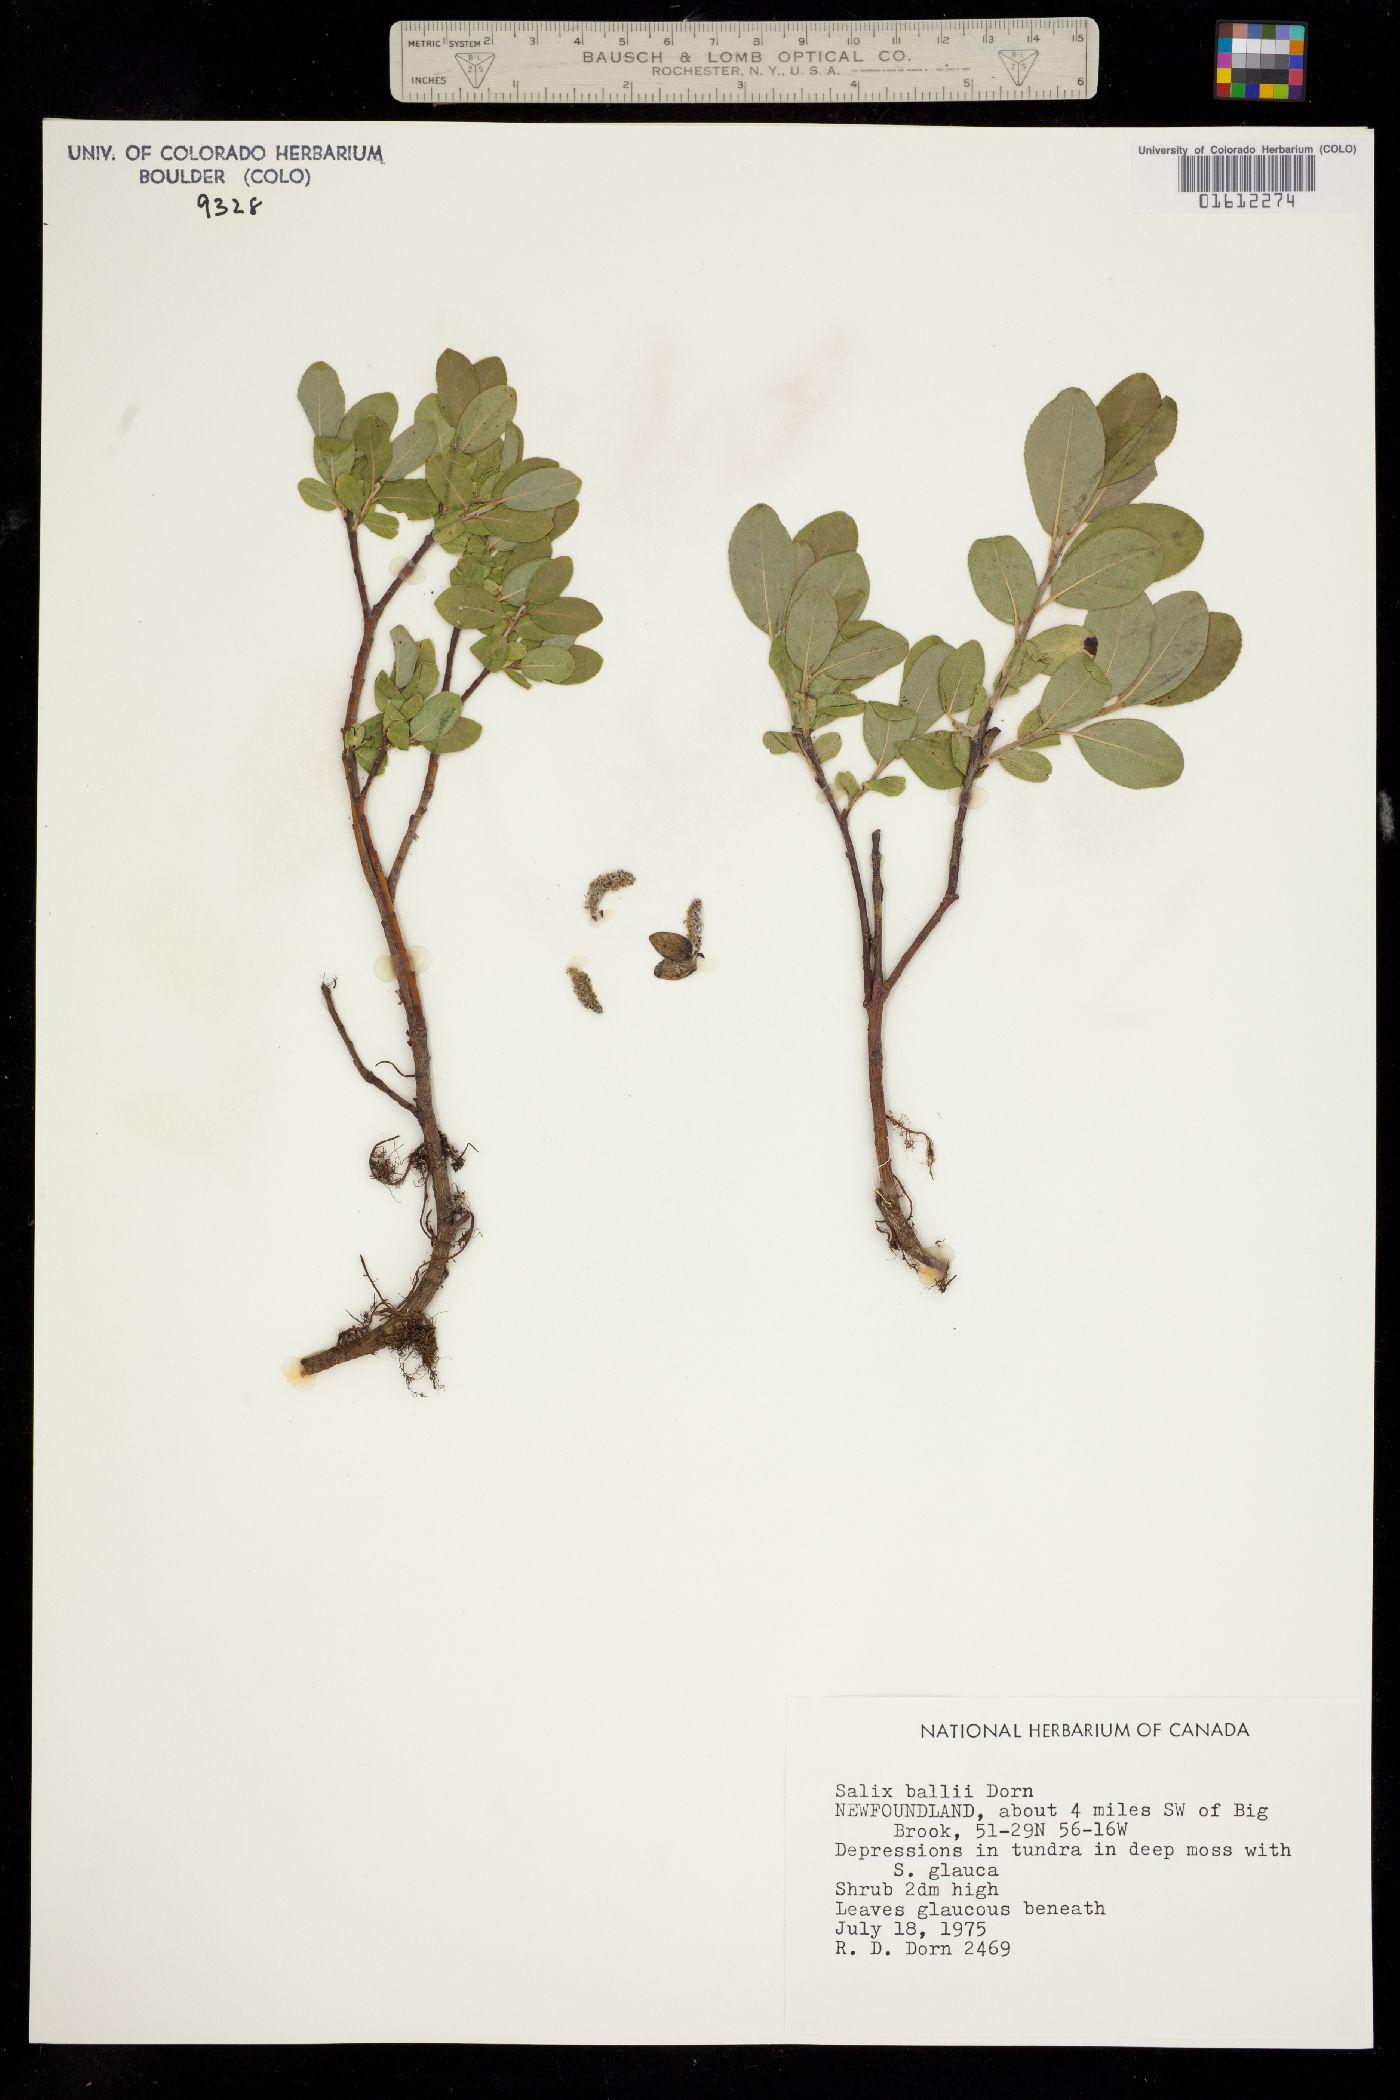 Salix ballii image